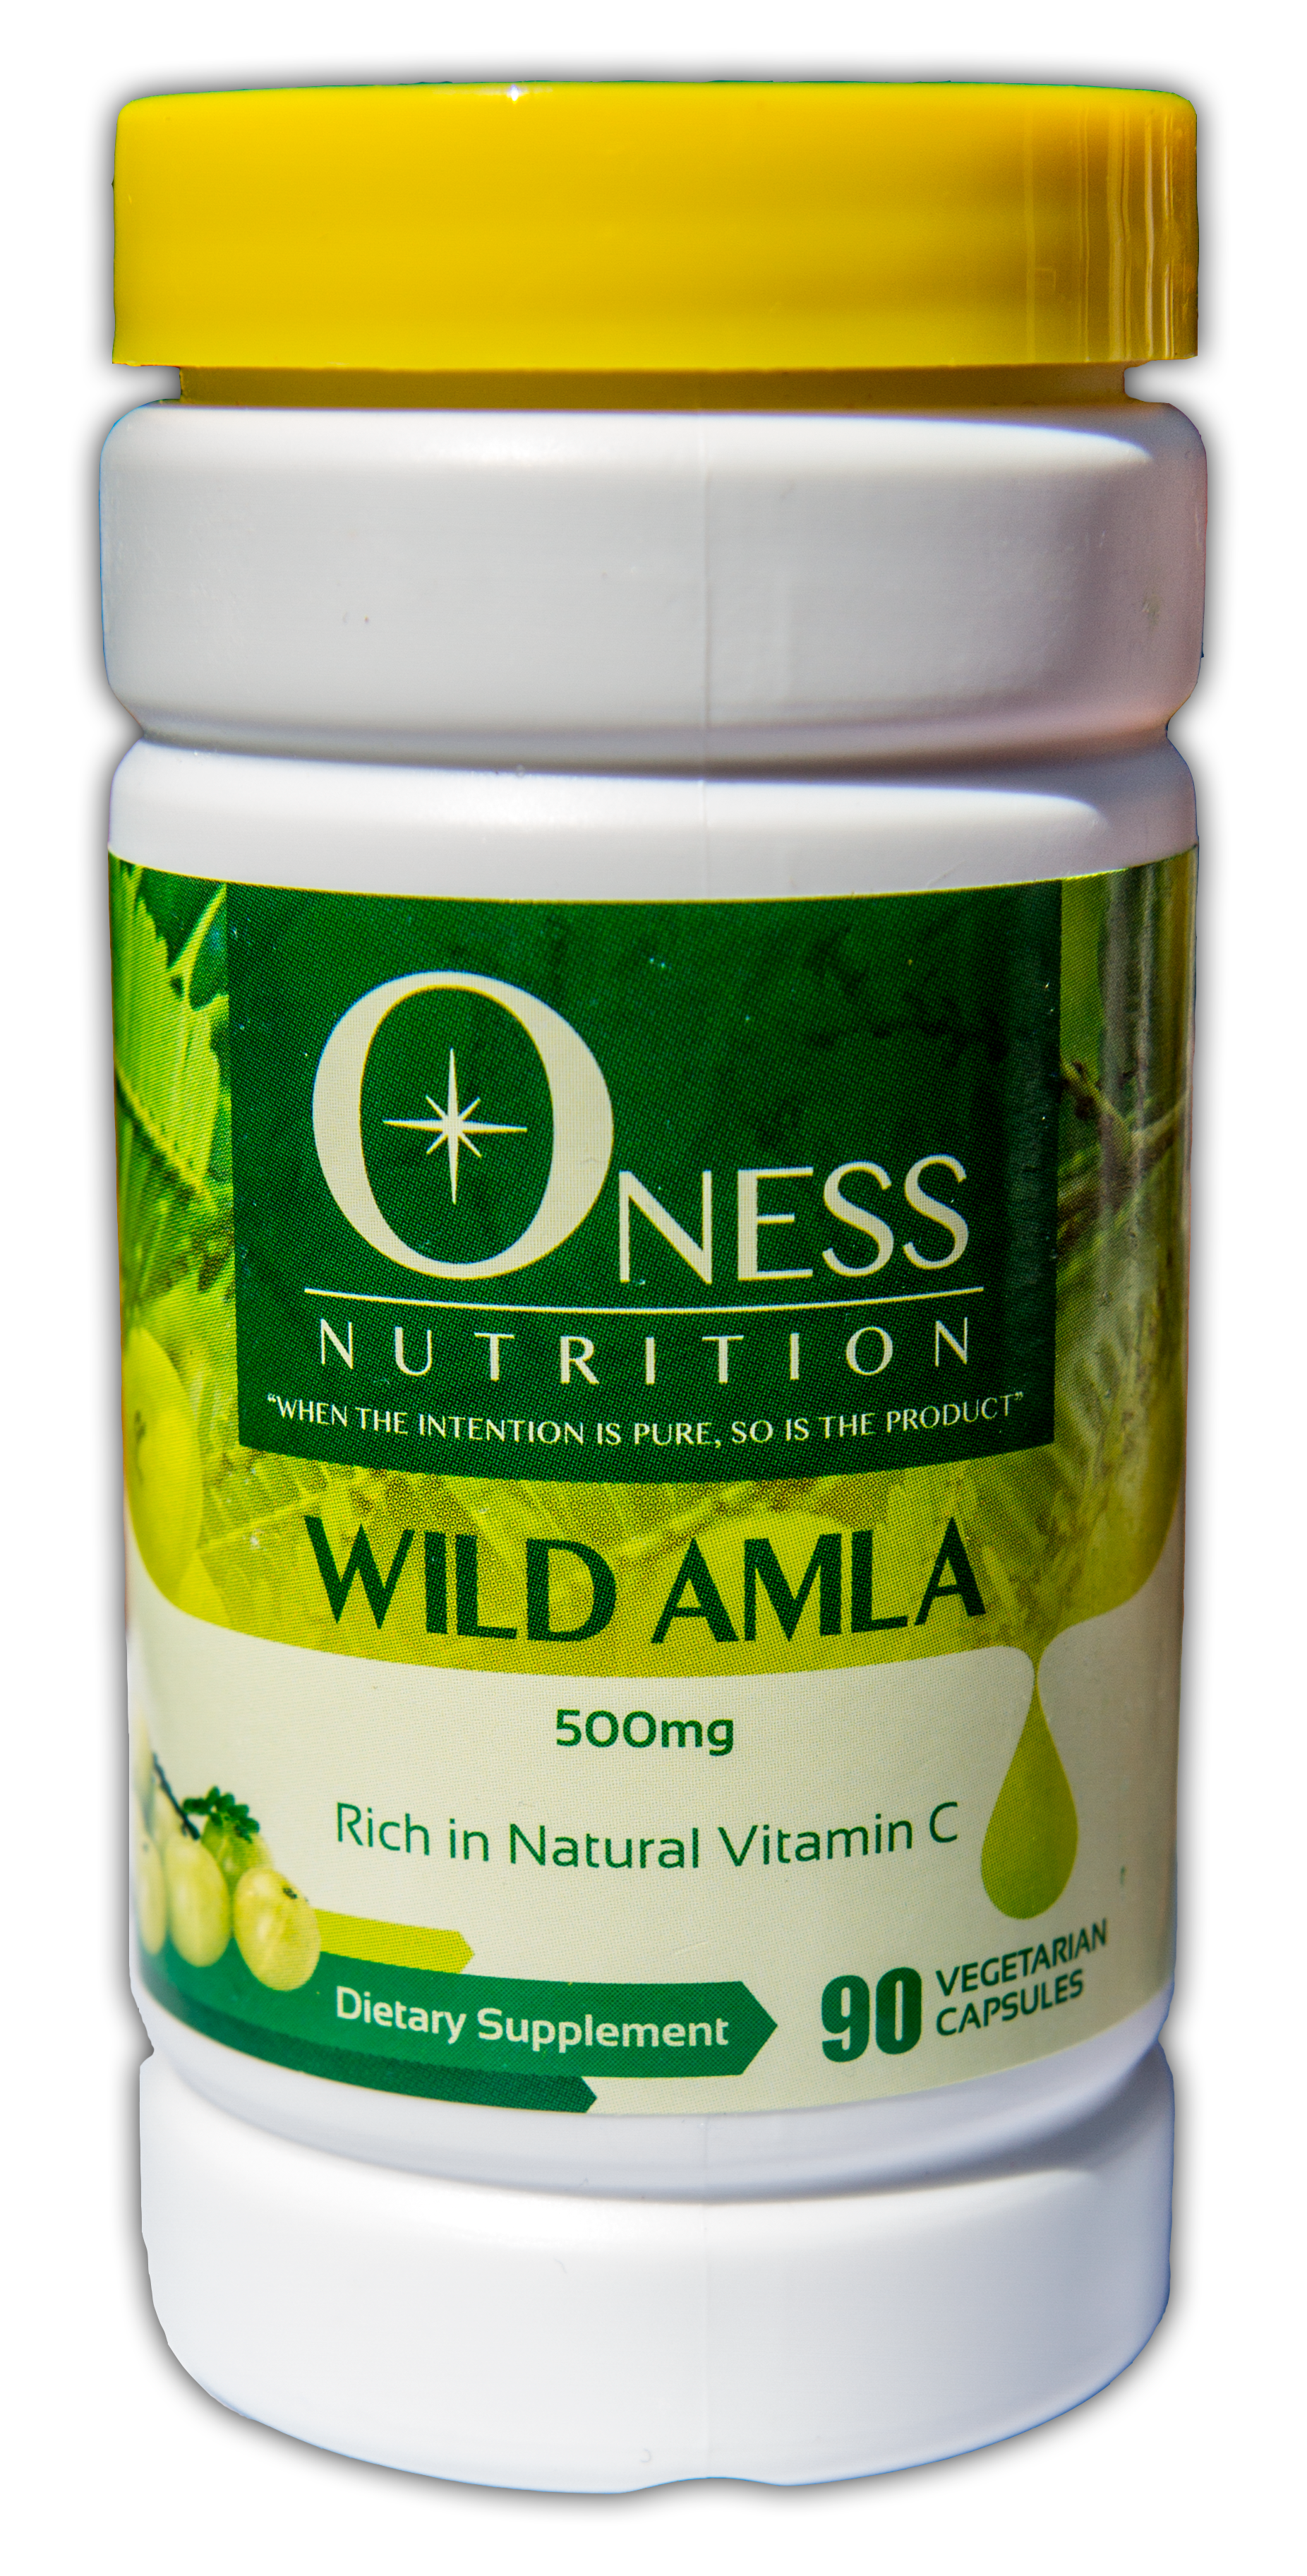 Wild Amla Natural Vitamin C